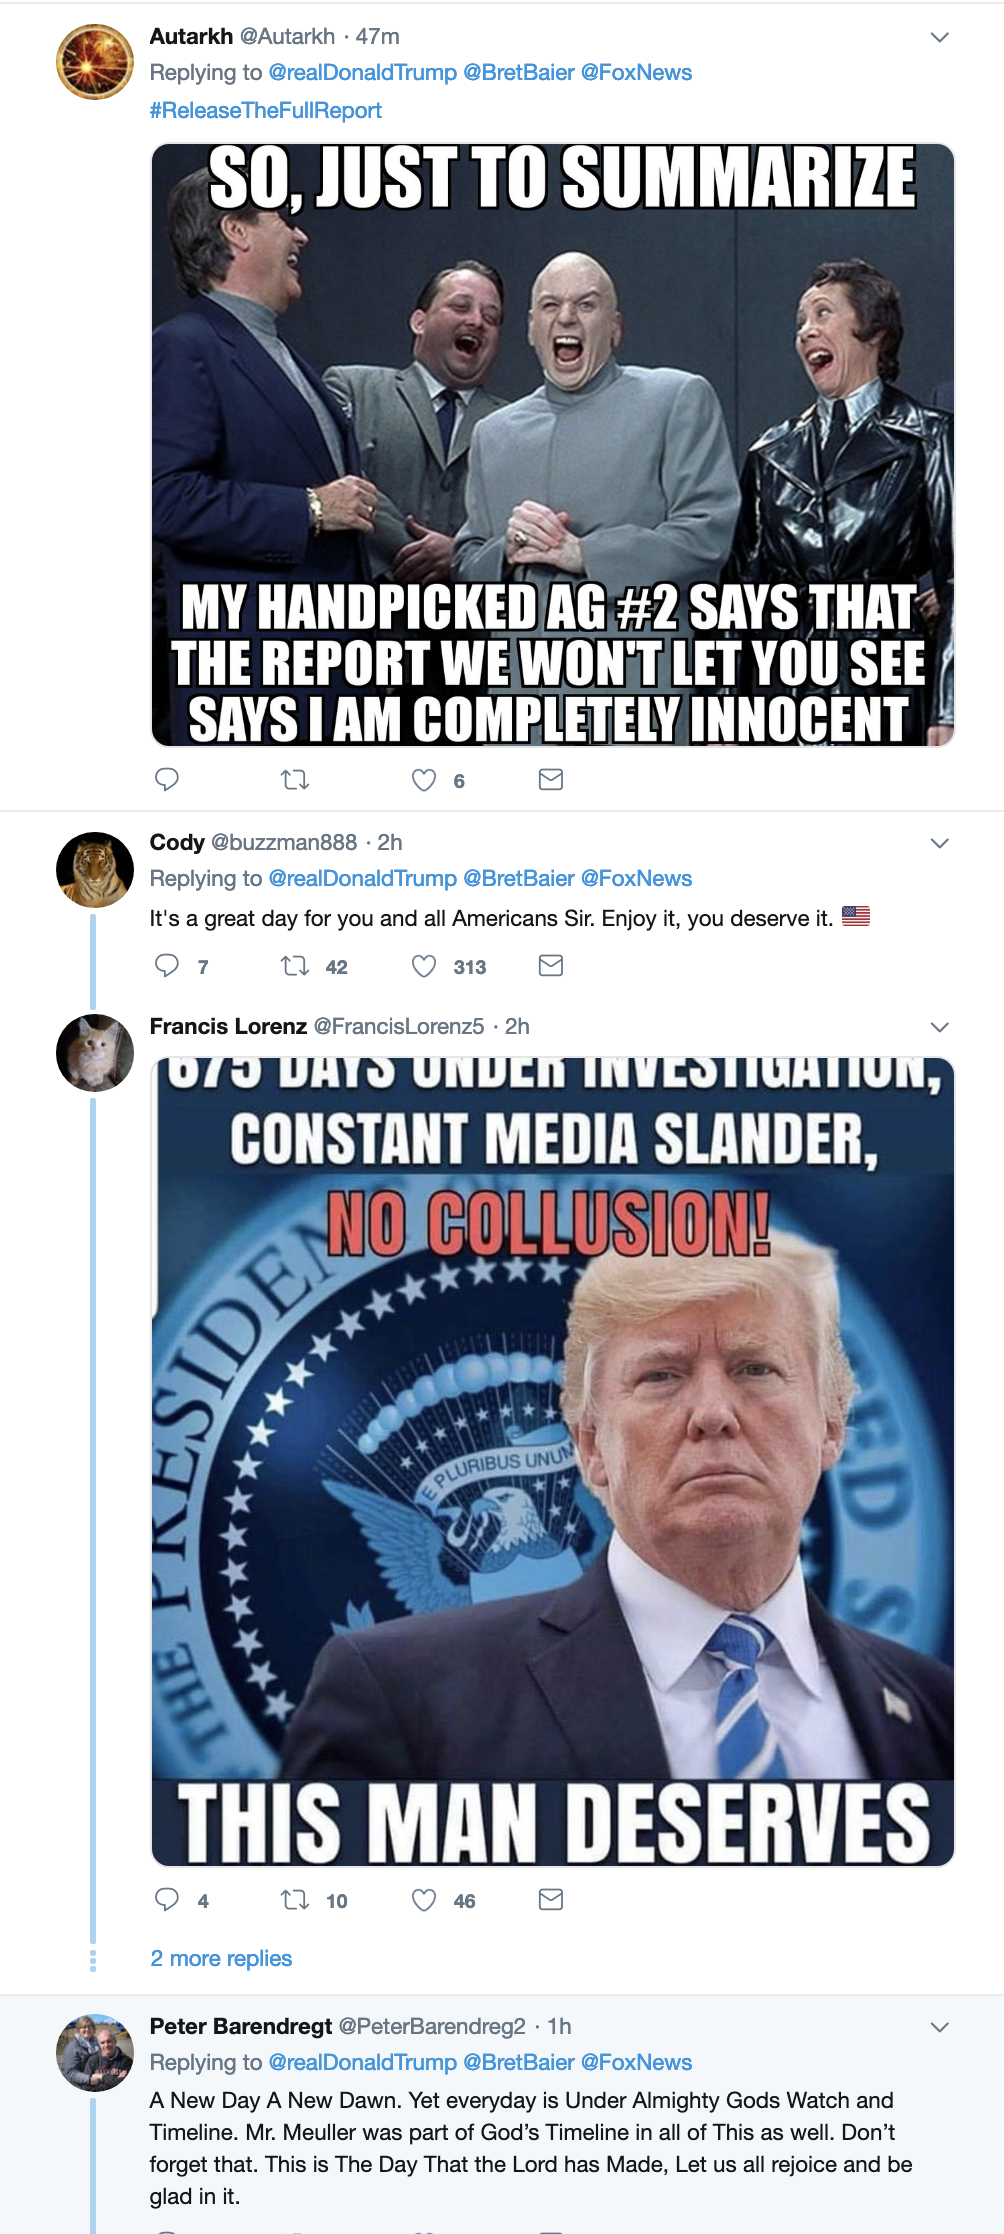 Screen-Shot-2019-03-25-at-6.48.49-AM Trump Rockets Out Of Bed To Unleash Monday A.M. Mueller Rant Corruption Crime Donald Trump Mueller Politics Robert Mueller Russia Top Stories